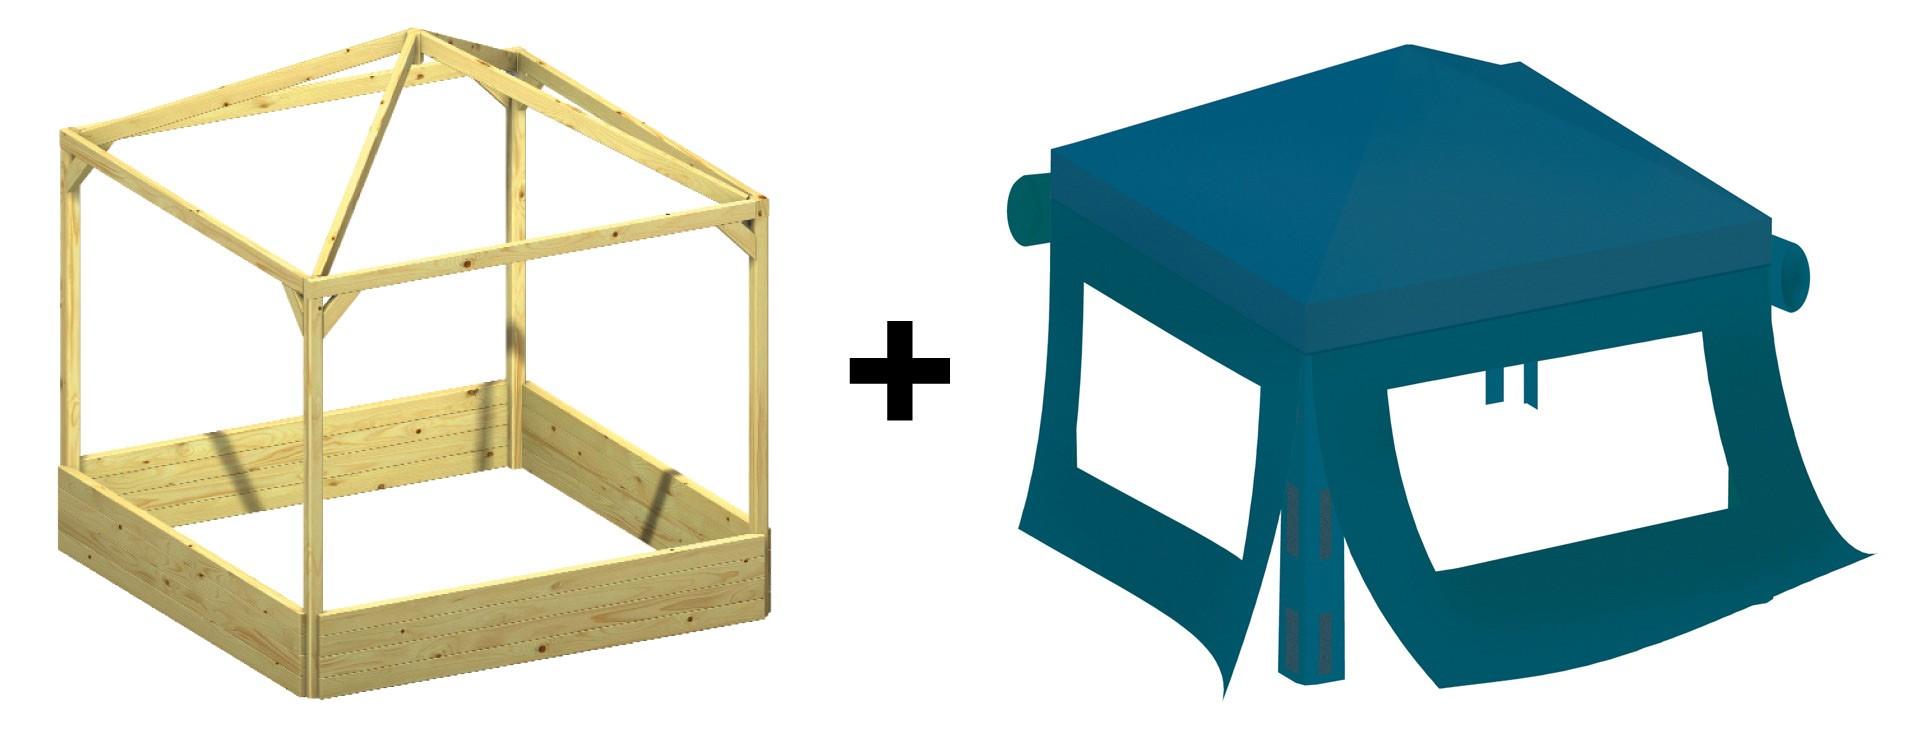 kinderpavillon sandkasten benjamin mit dach 164x164x180cm bei. Black Bedroom Furniture Sets. Home Design Ideas